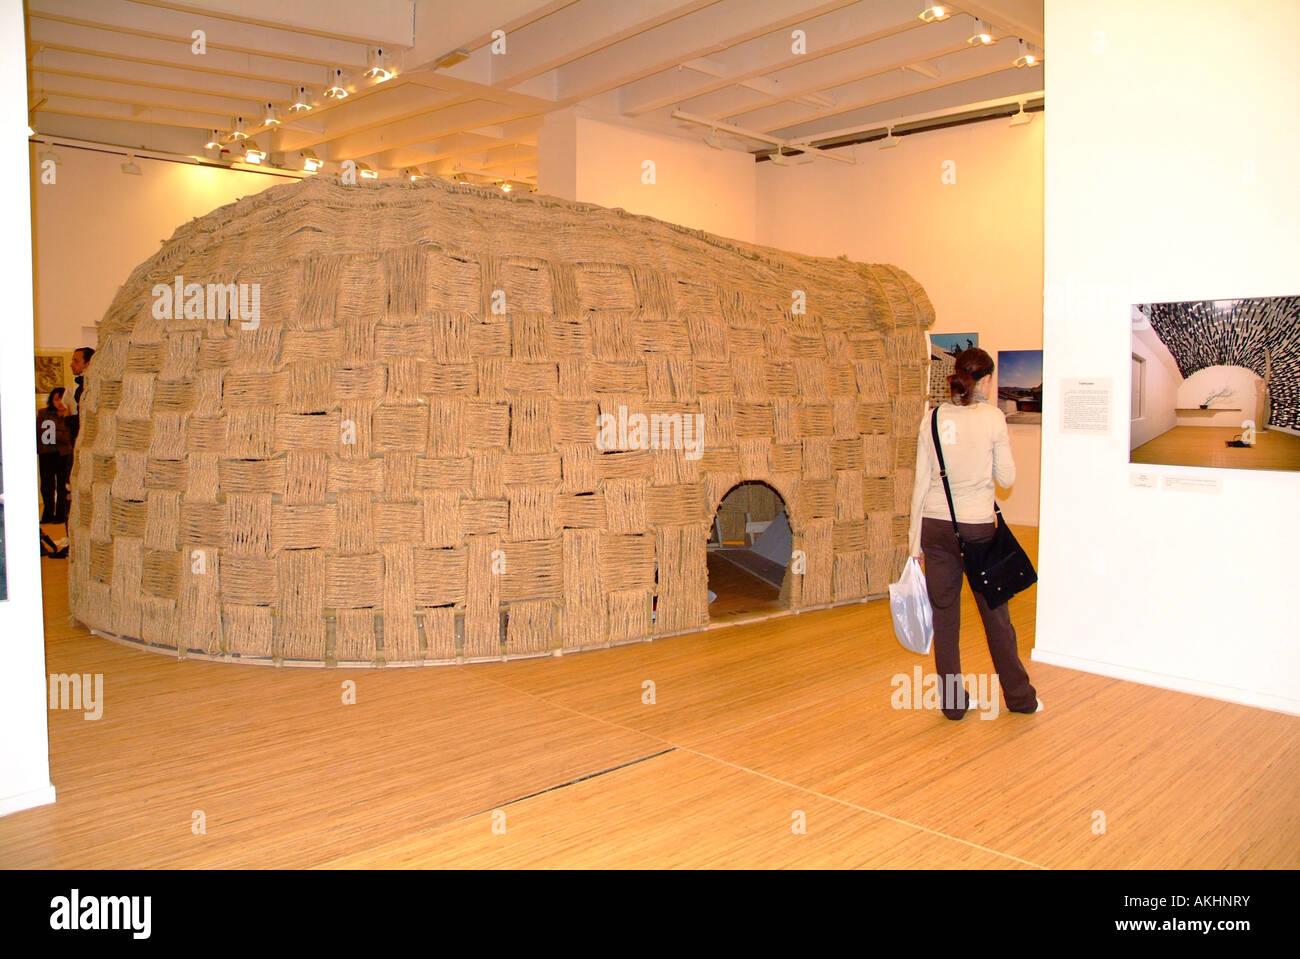 Japan pavilion, Biennale di Architettura exibition, Venice, Veneto, Italy Stock Photo